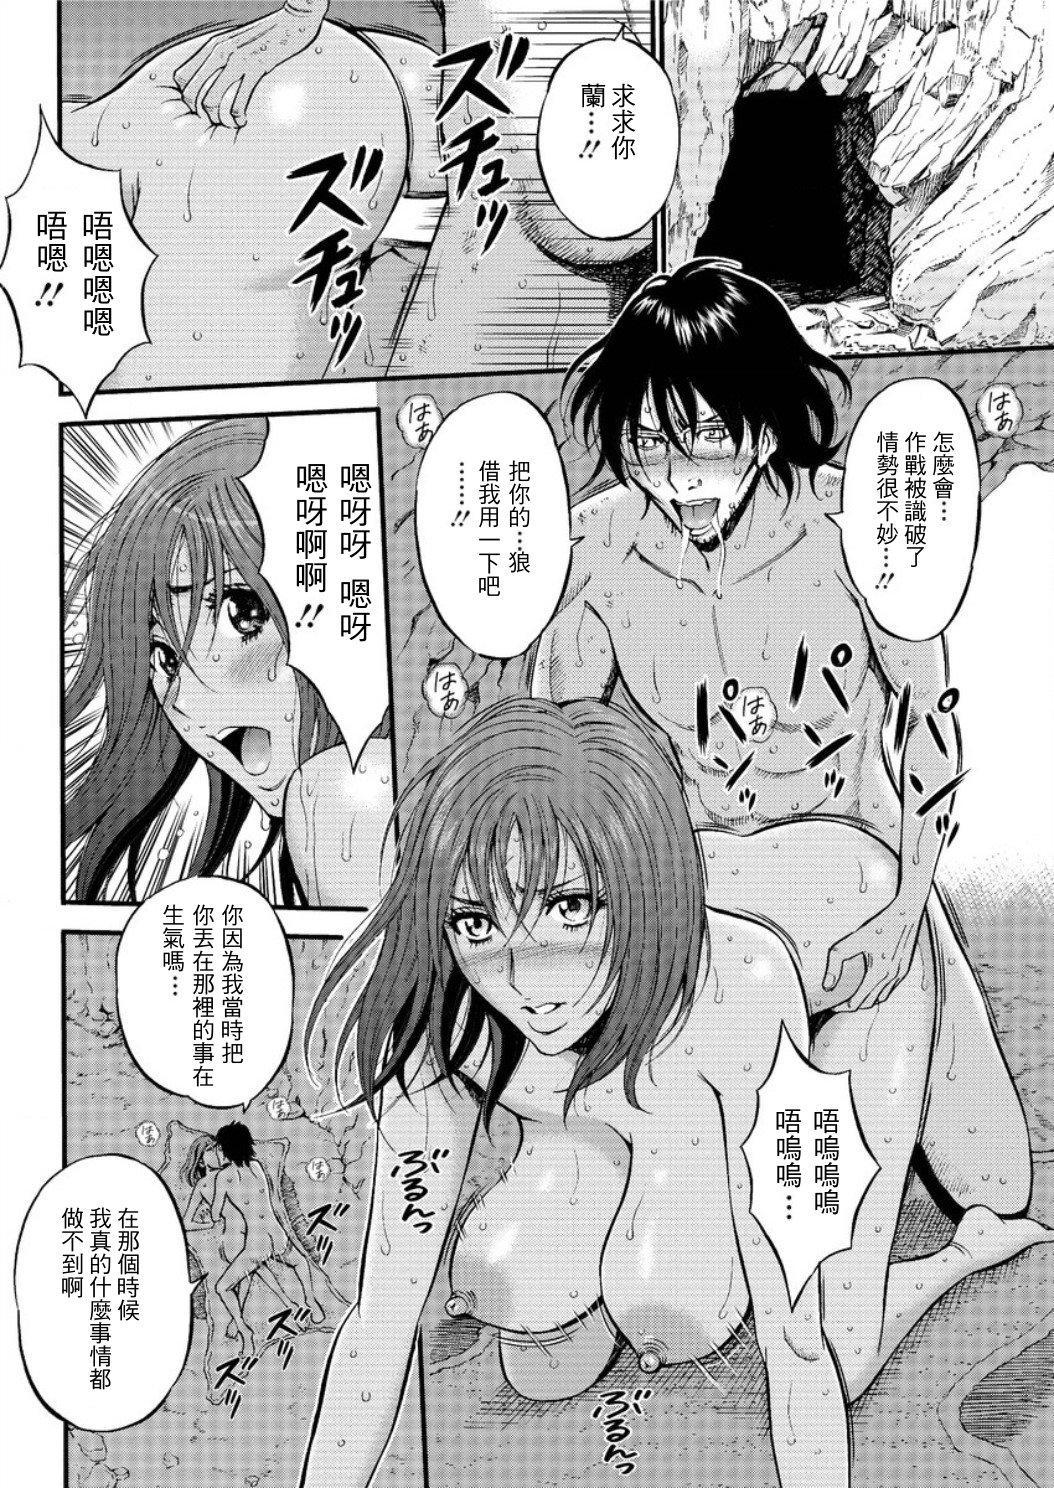 Kigenzen 10000 Nen no Ota | 史前一萬年的宅男 Ch. 19-24 82